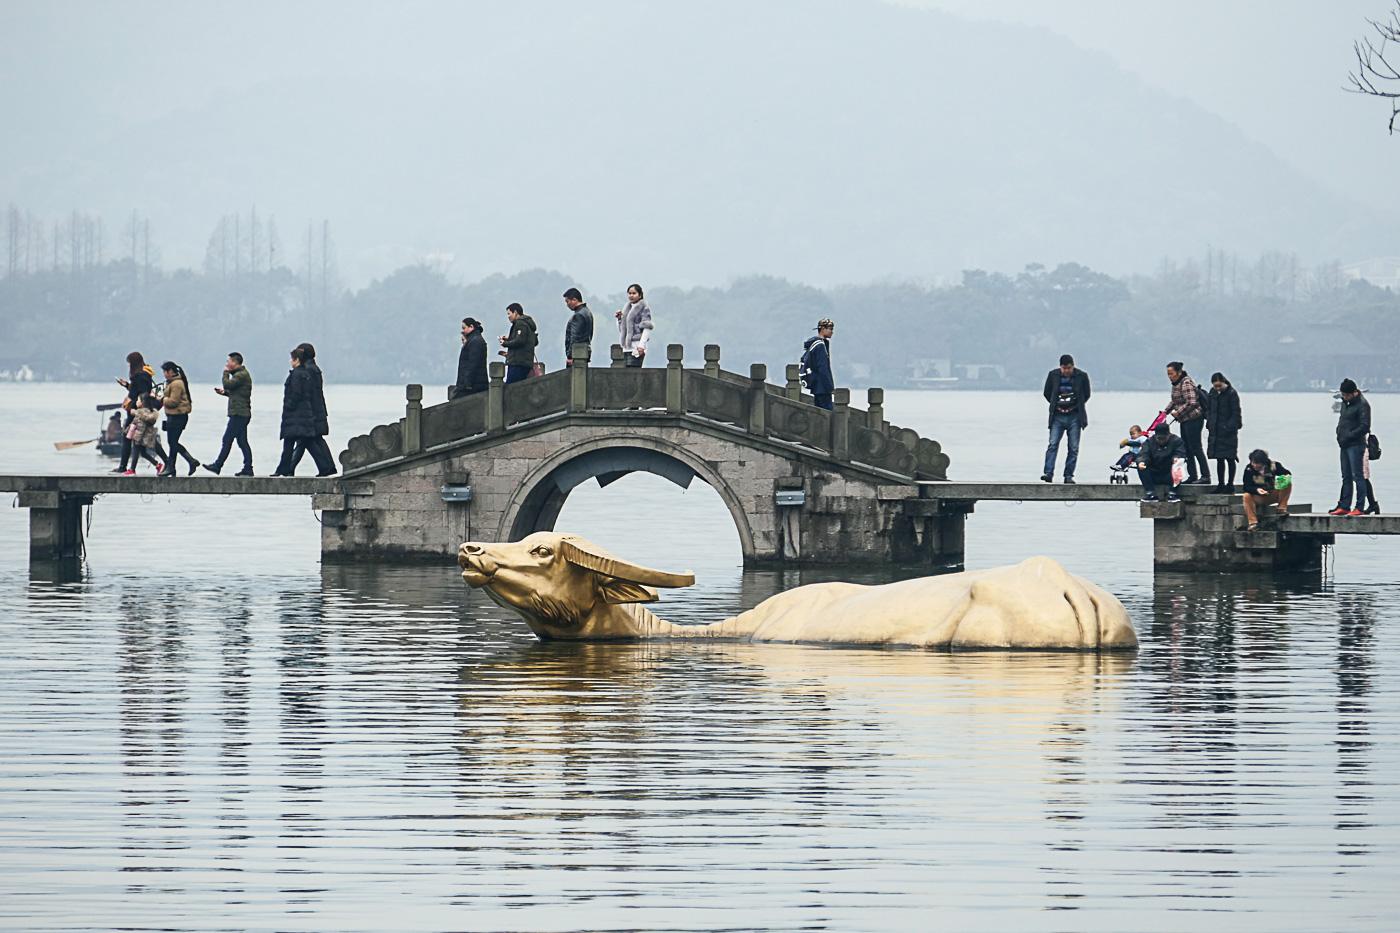 Scenic bridge and the golden cow